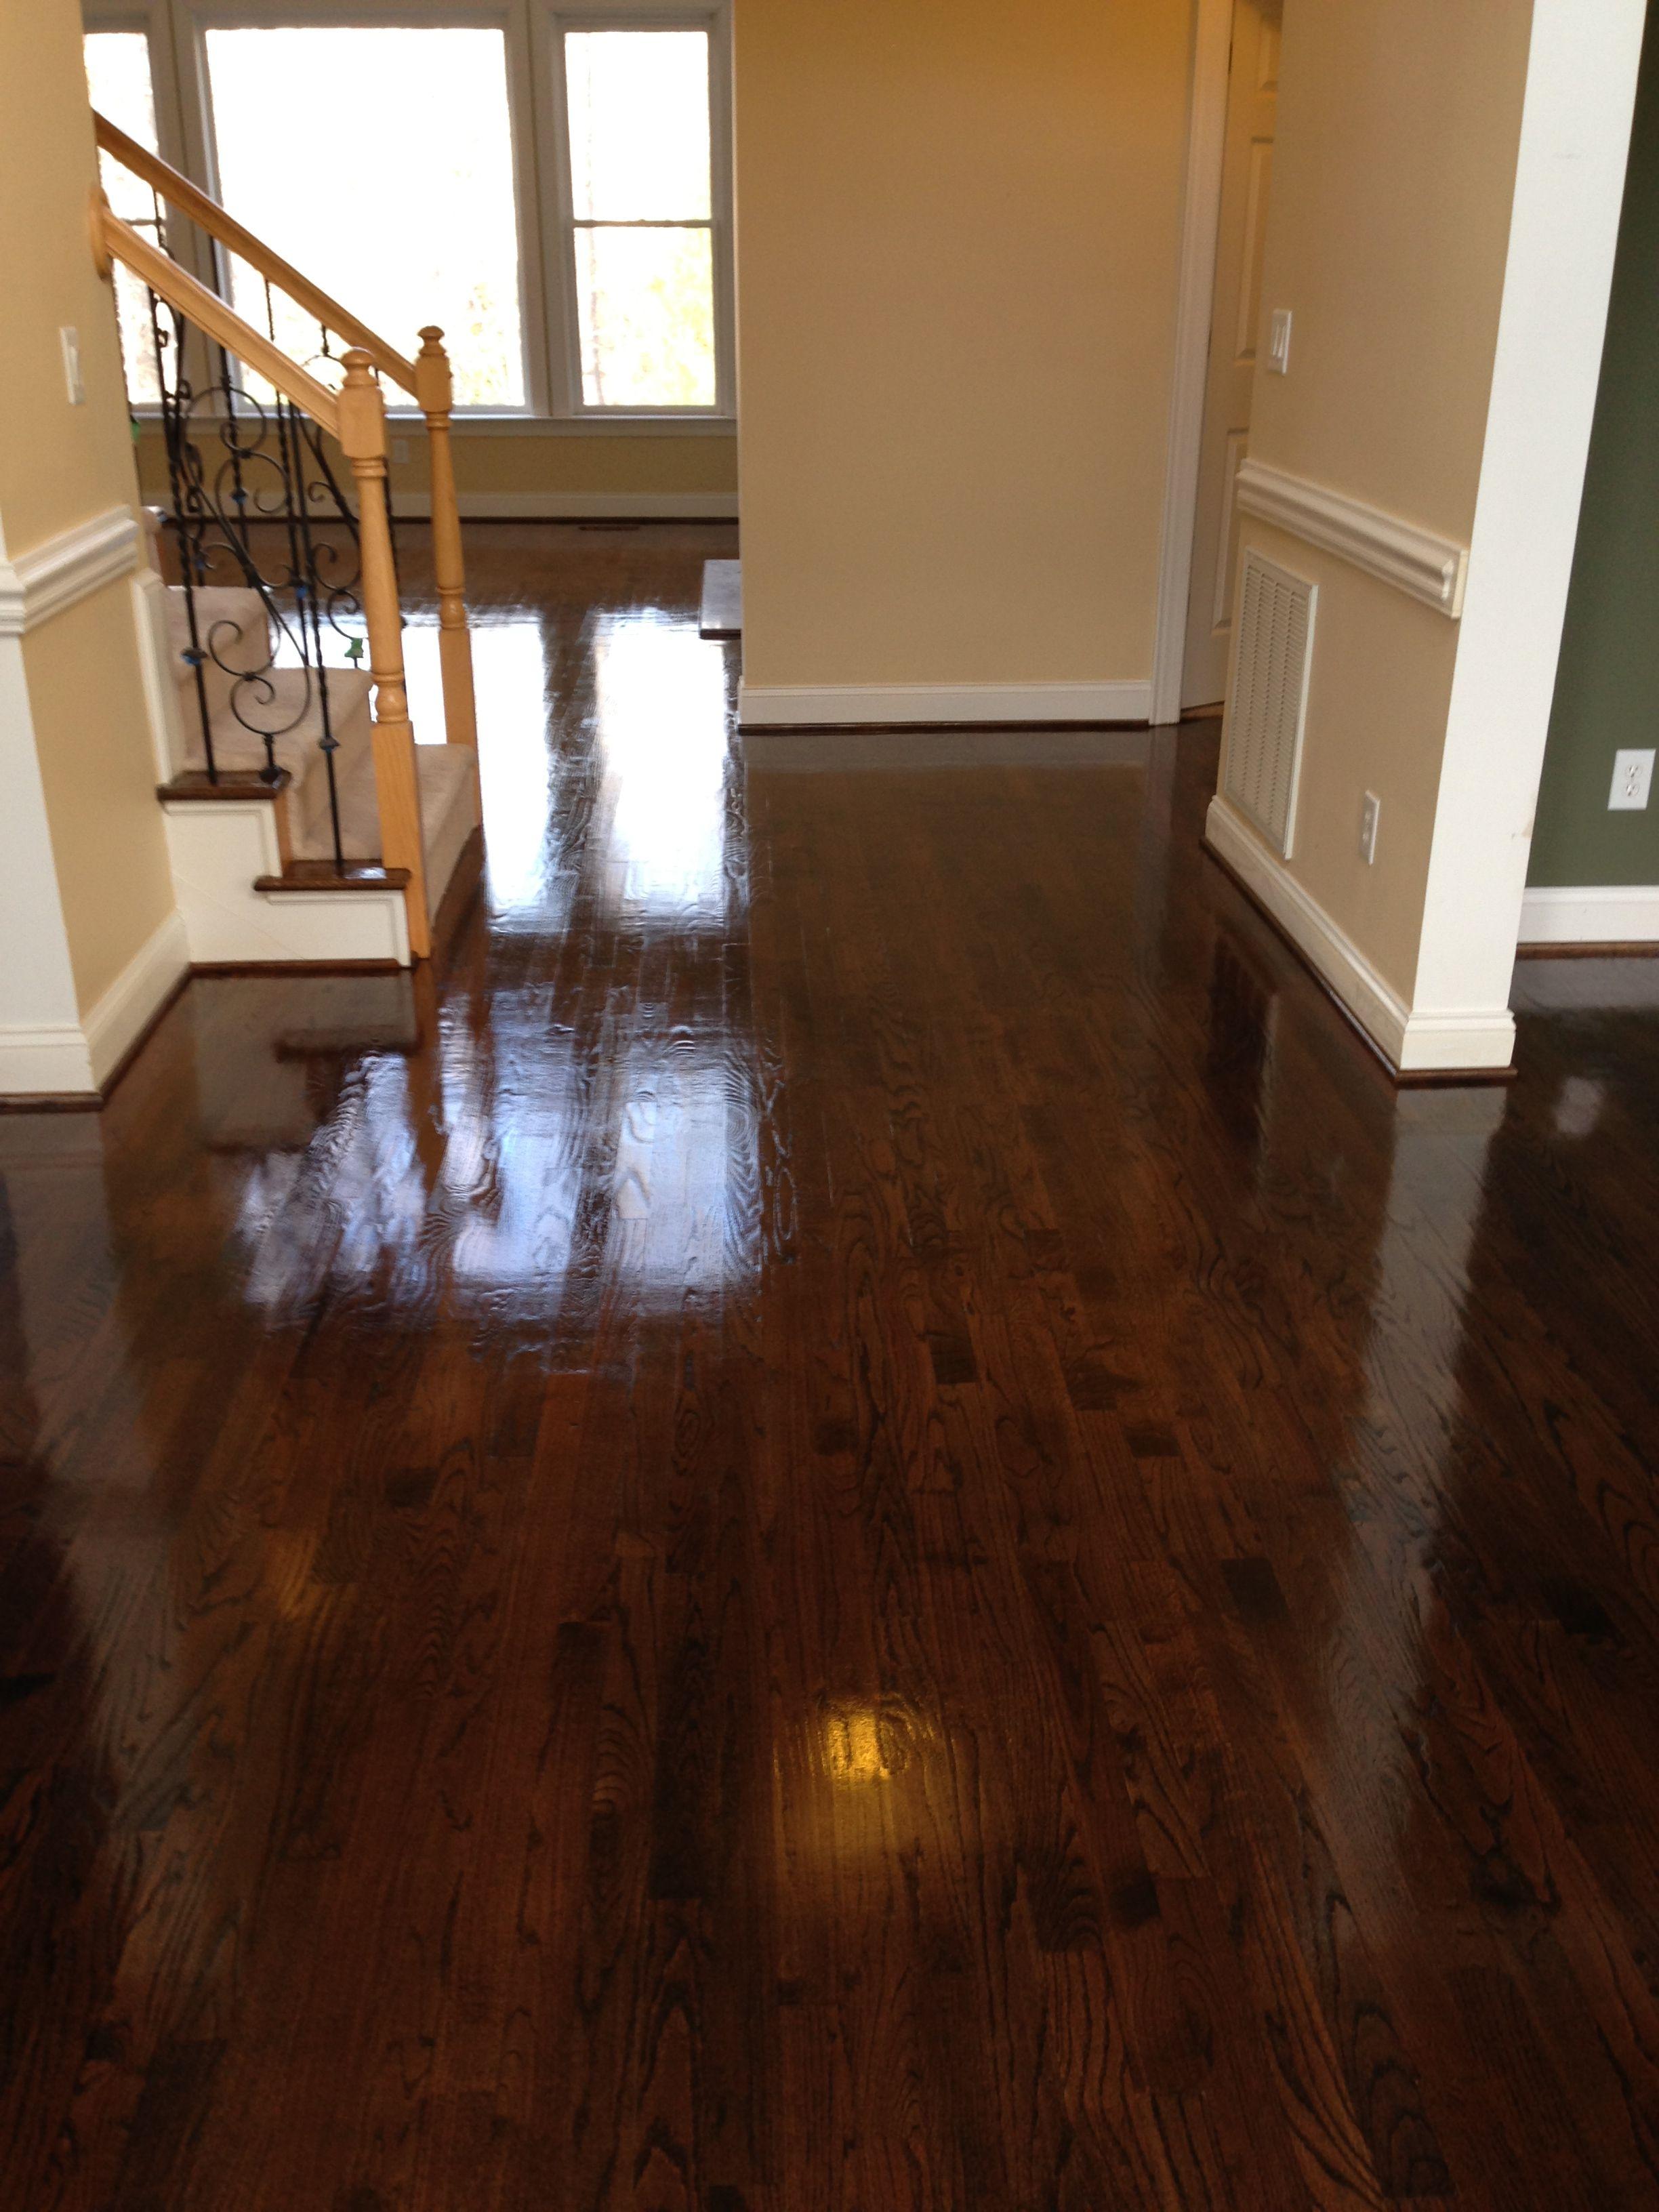 Red Oak Hardwood Floors After Three Coats Of Polyurethane